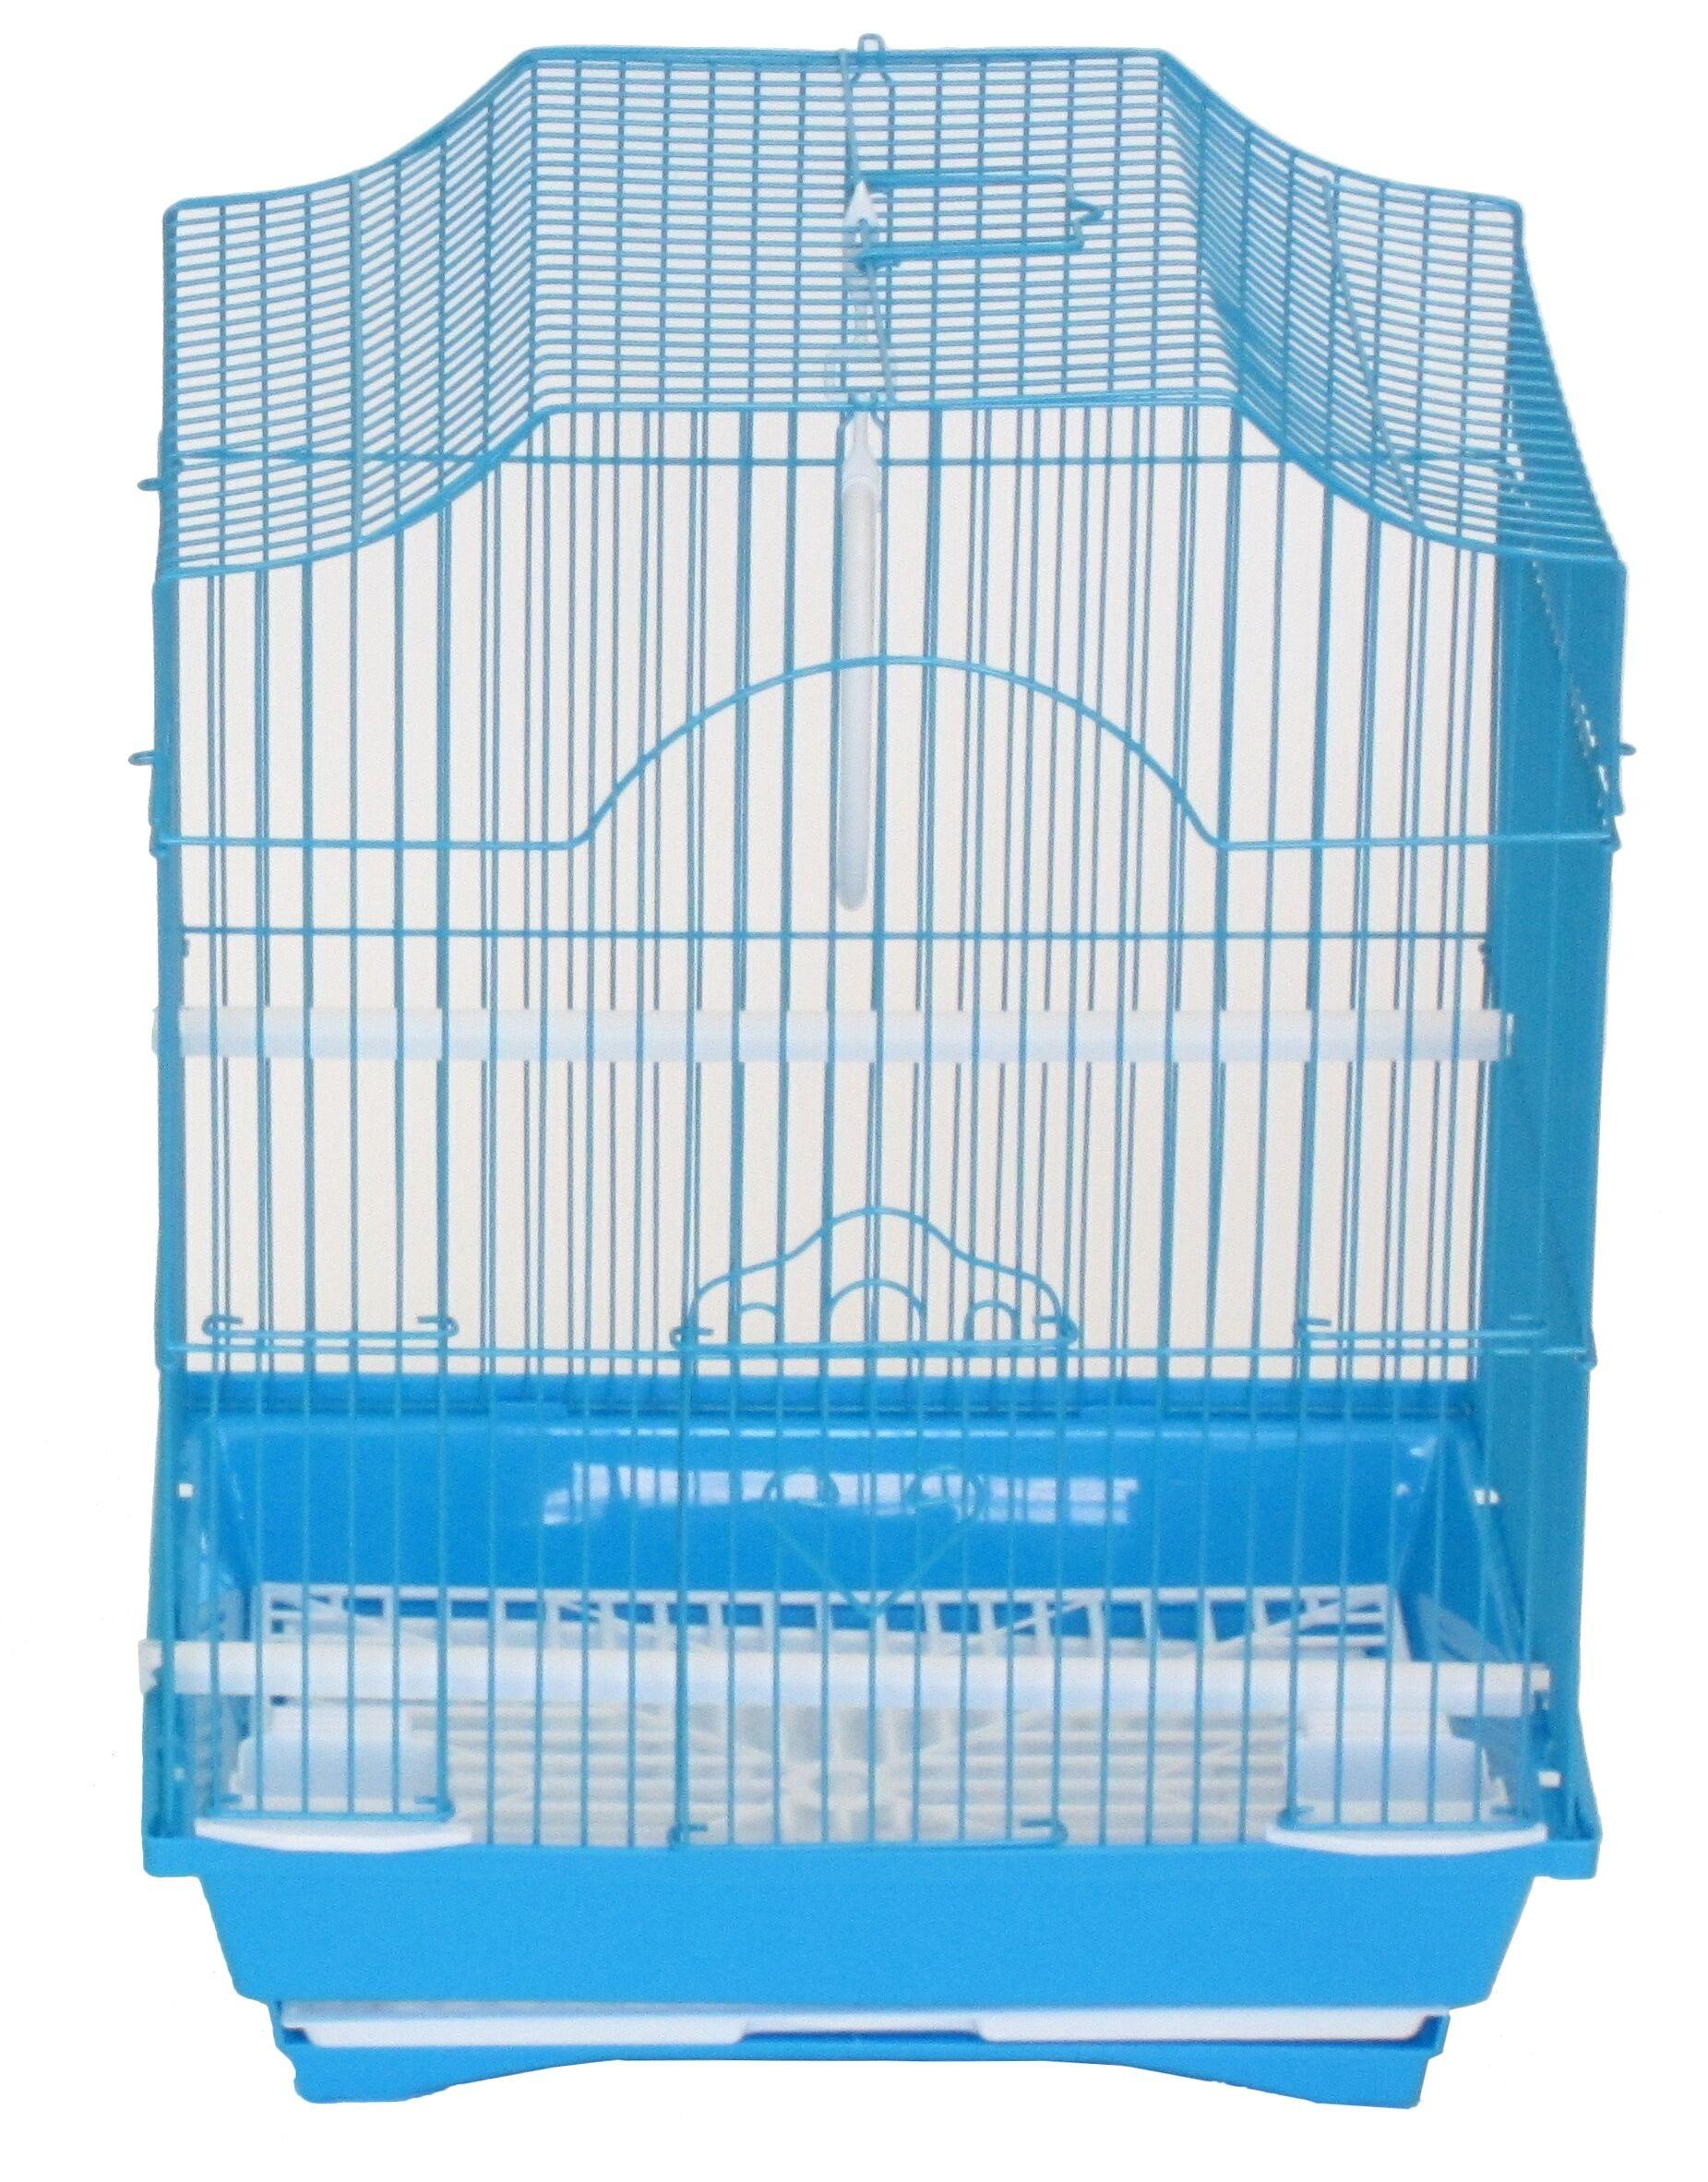 Iglesias Cornerless Flat Top Bird Cage Color: Blue